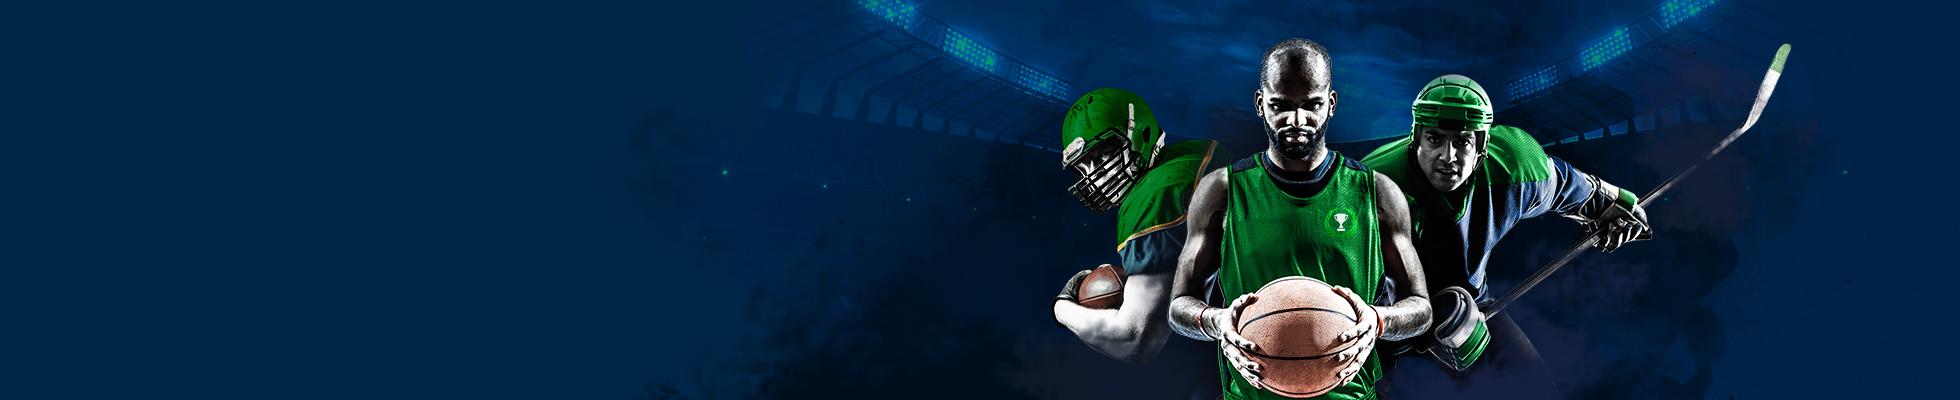 Canada's Best Online Casino & Sportsbook